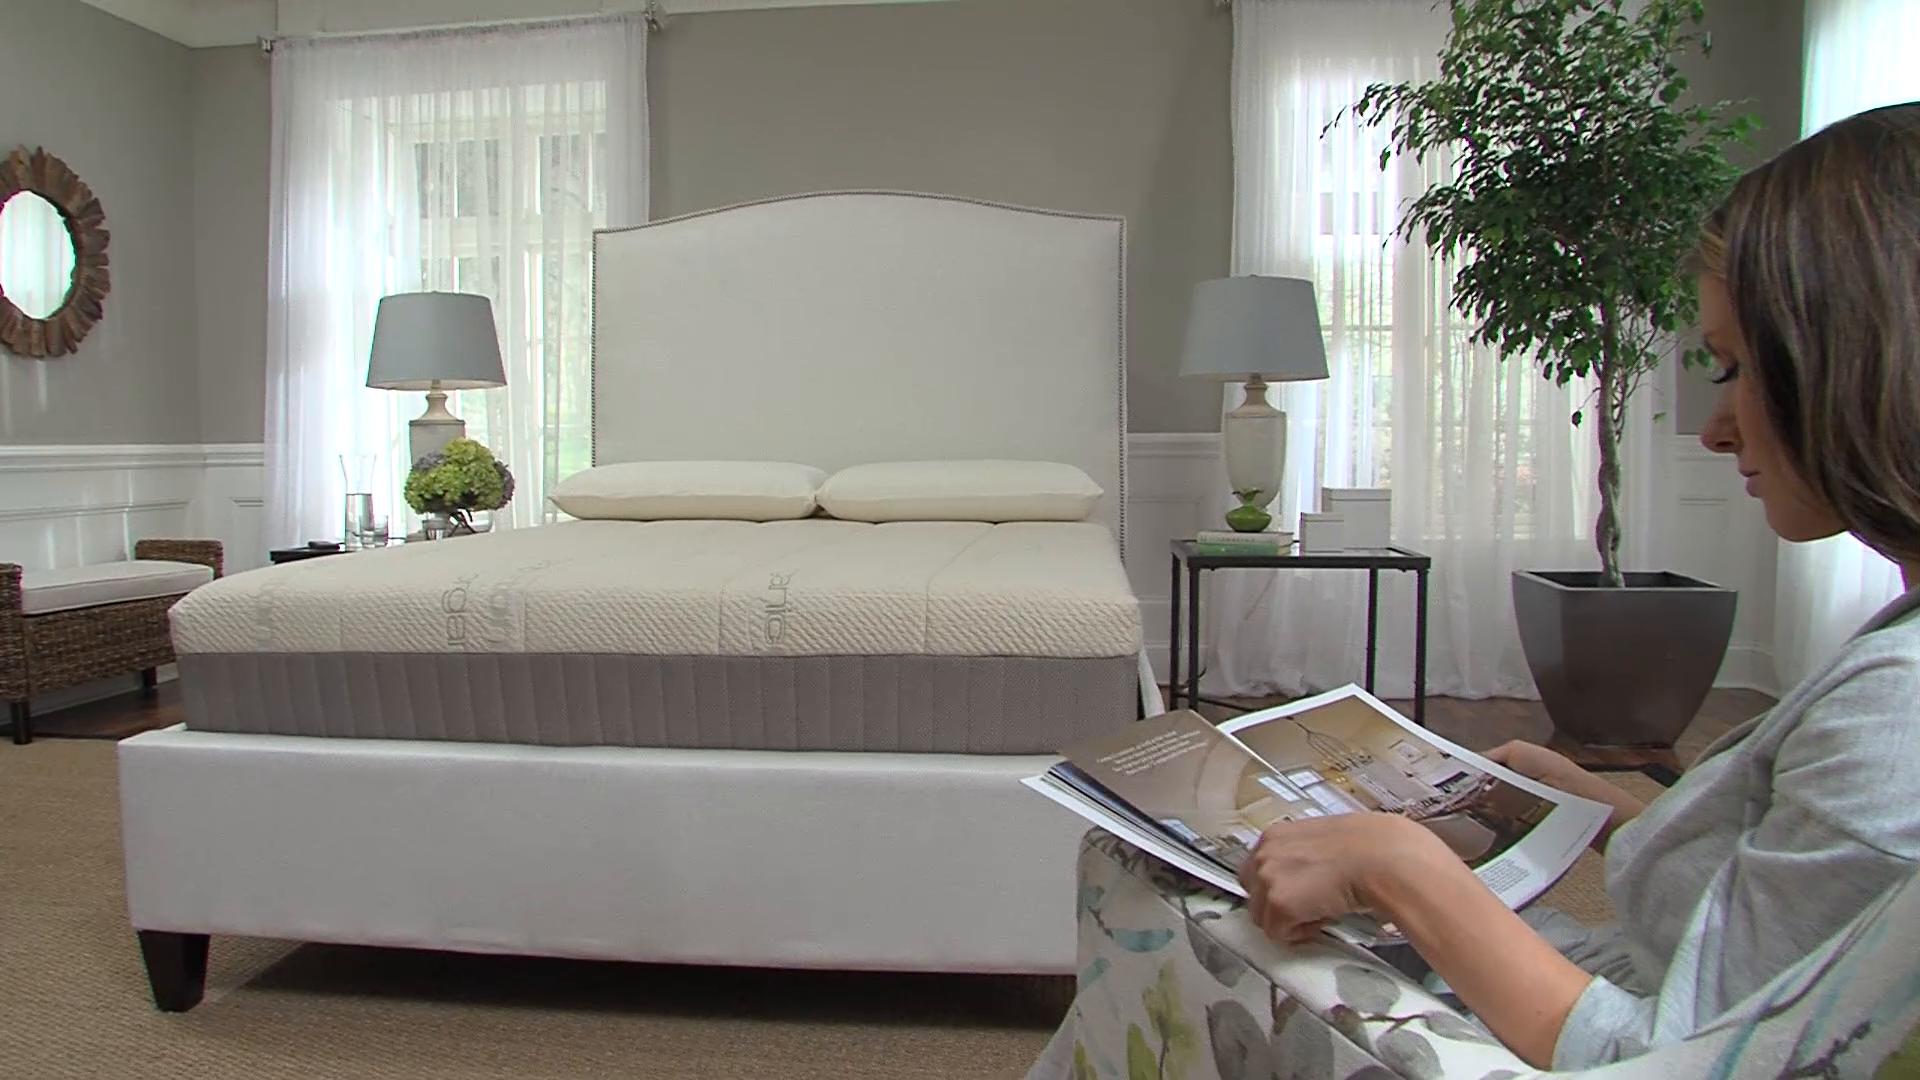 sleep science 9 natural latex king mattress with foundation medium